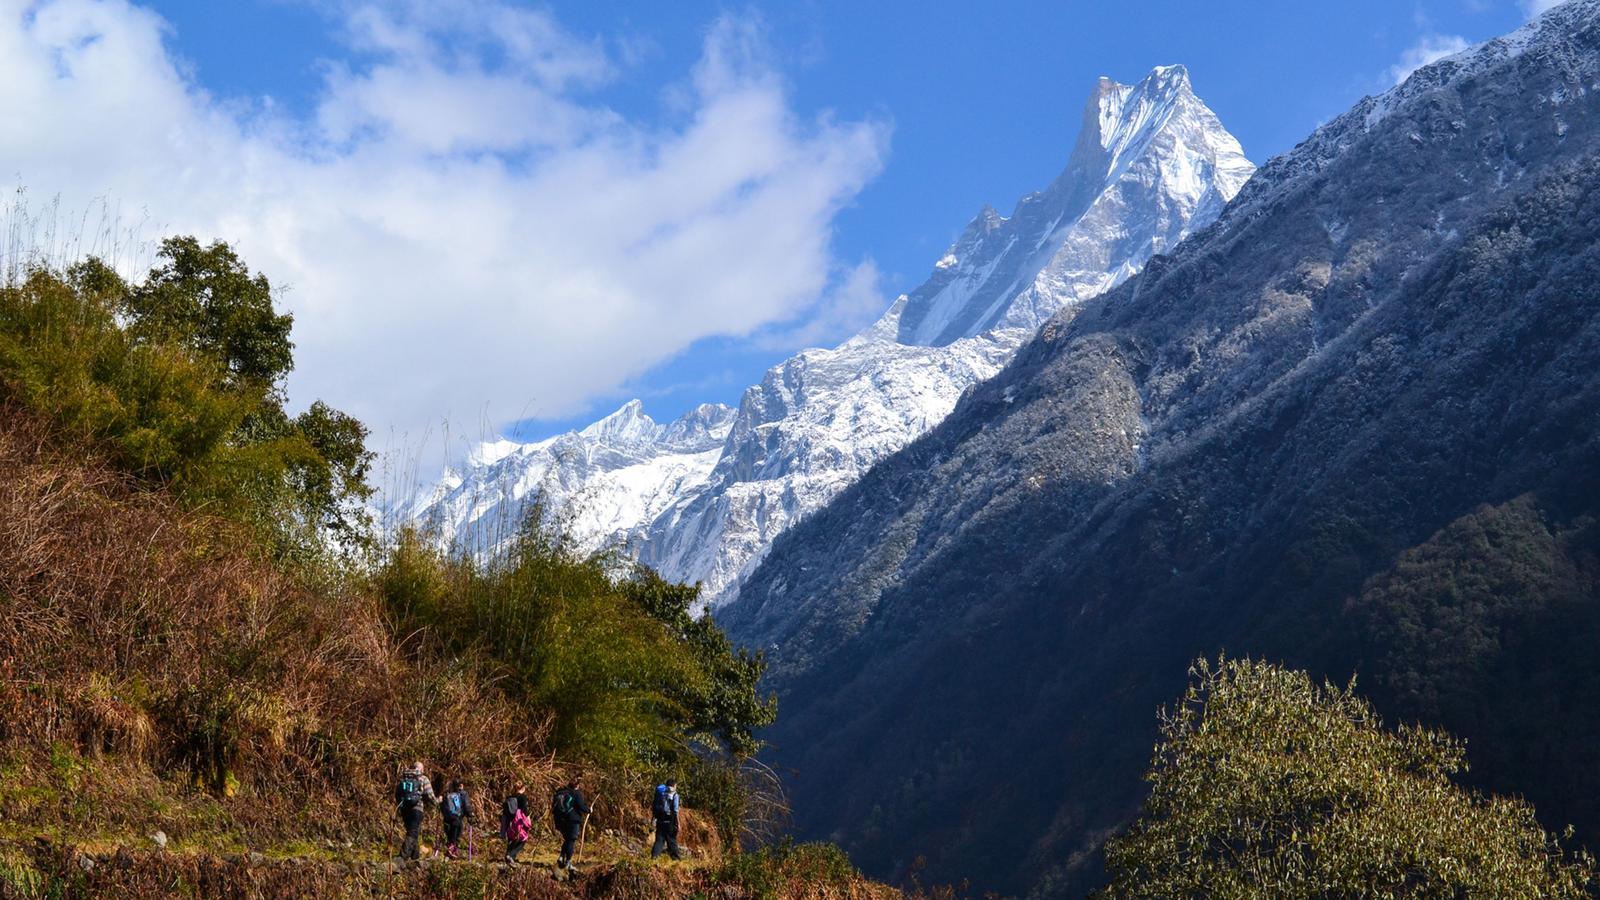 annapurna circuit trek in nepal  asia